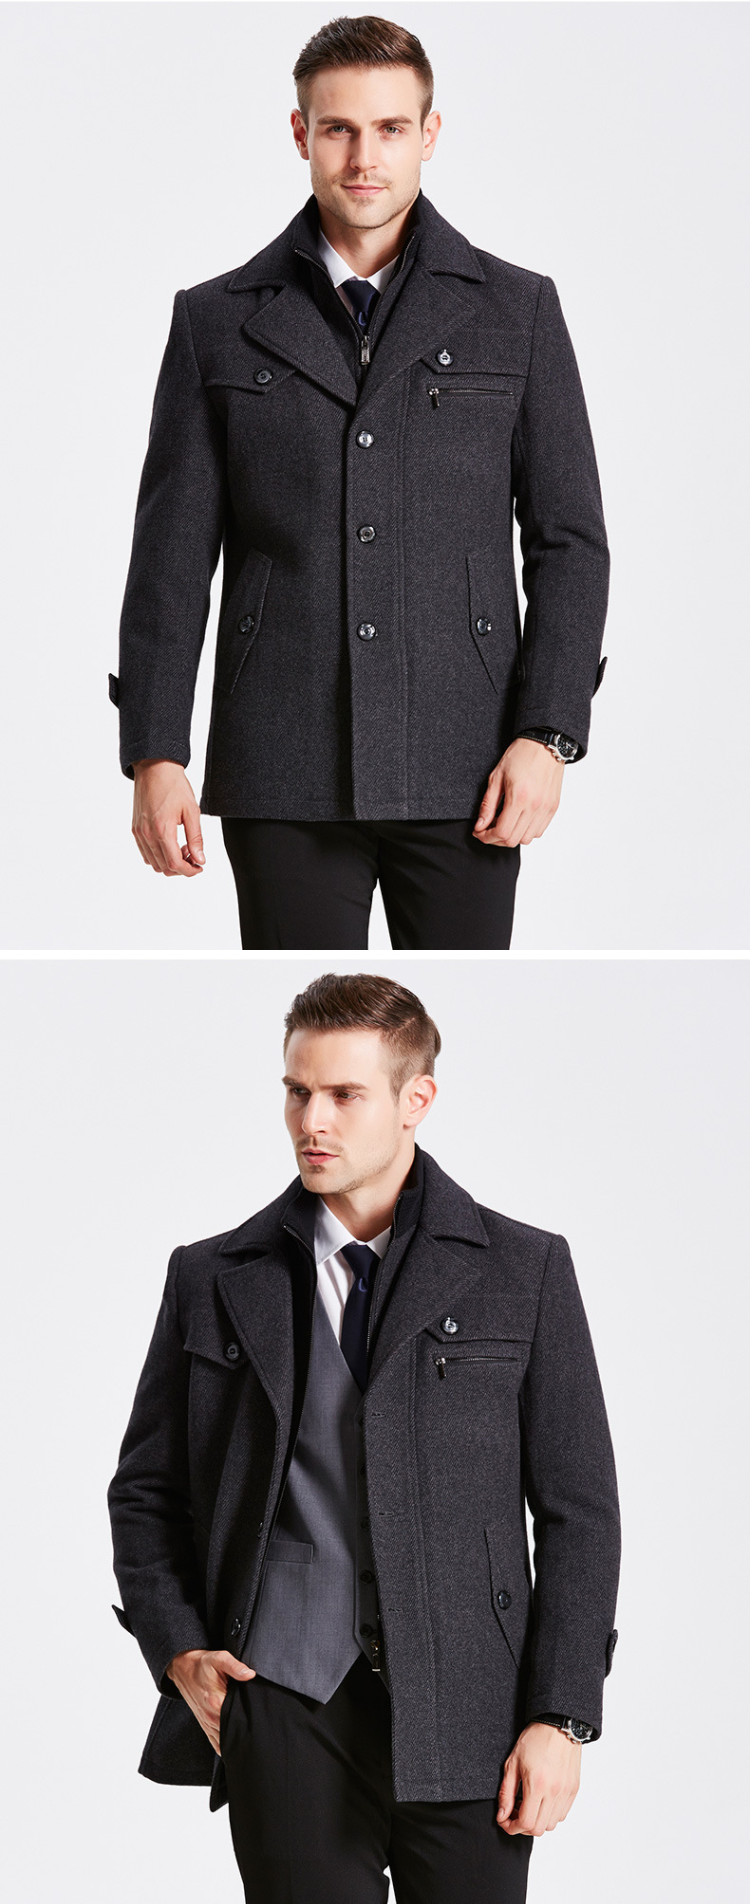 HTB10GioeYYI8KJjy0Faq6zAiVXaX New Winter Wool Coat Slim Fit Jackets Mens Casual Warm Outerwear Jacket and coat Men Pea Coat Size M-4XL DROP SHIPPING